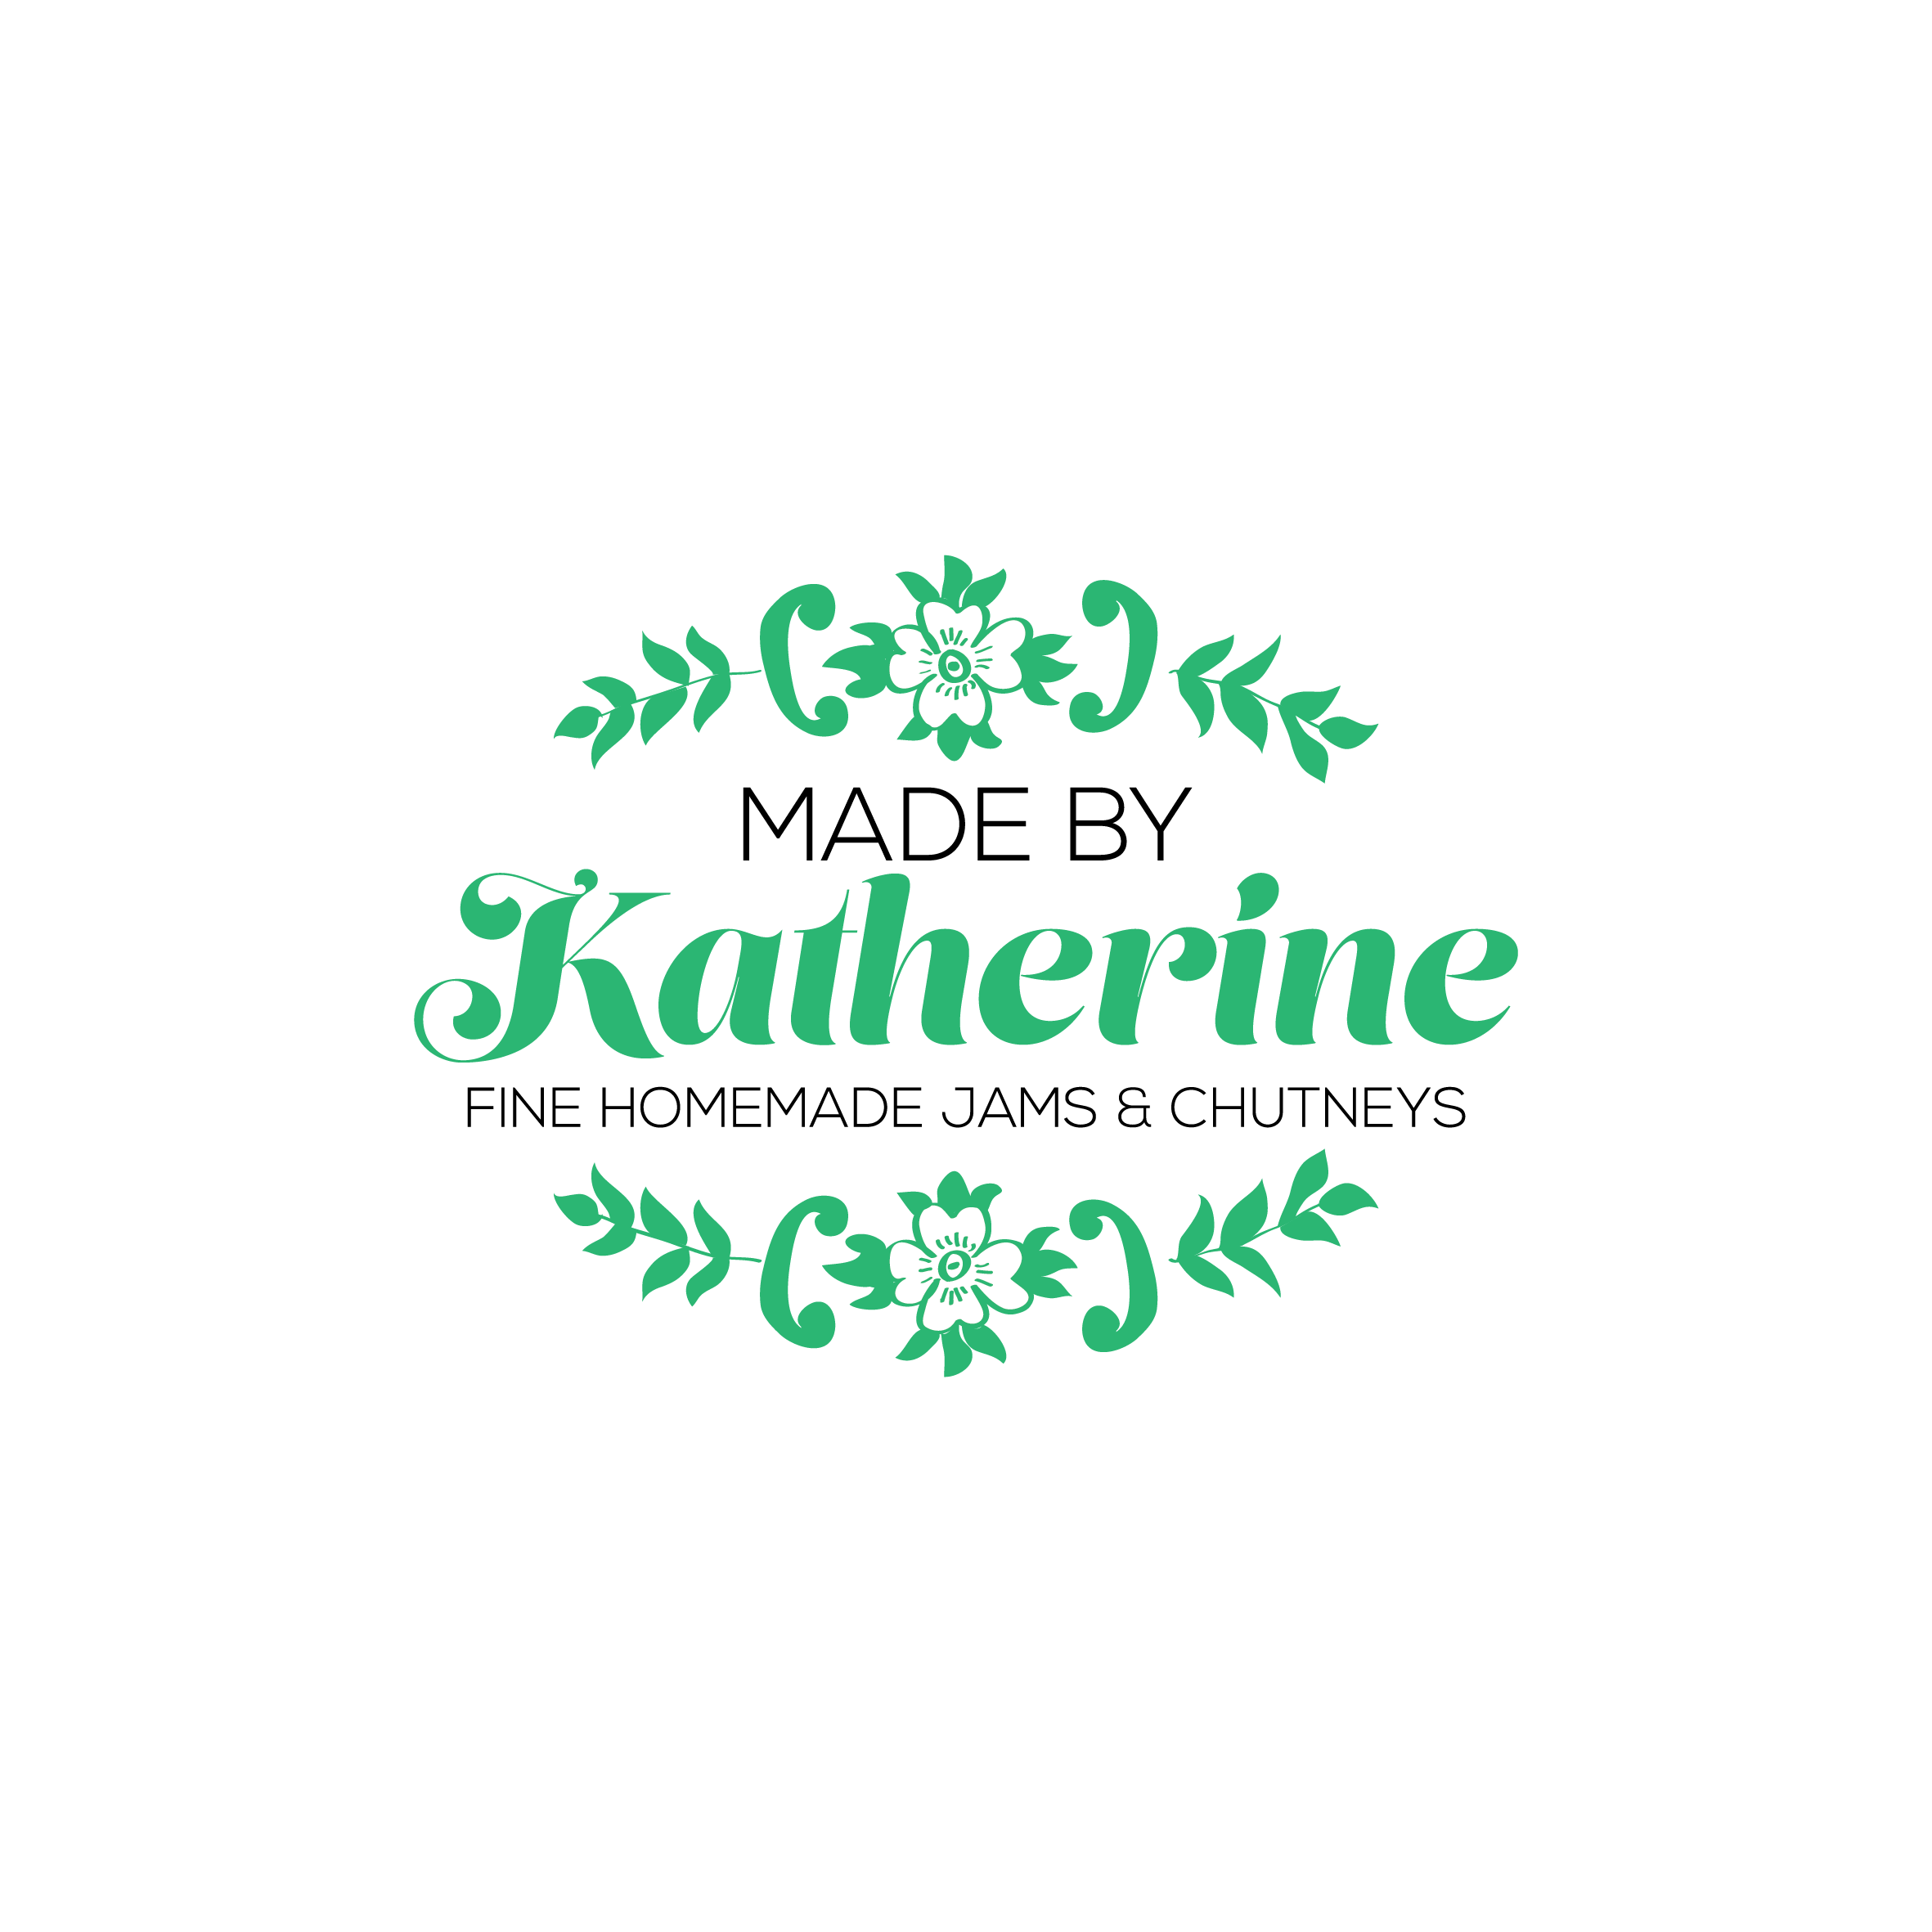 KatherineLogo-01.png